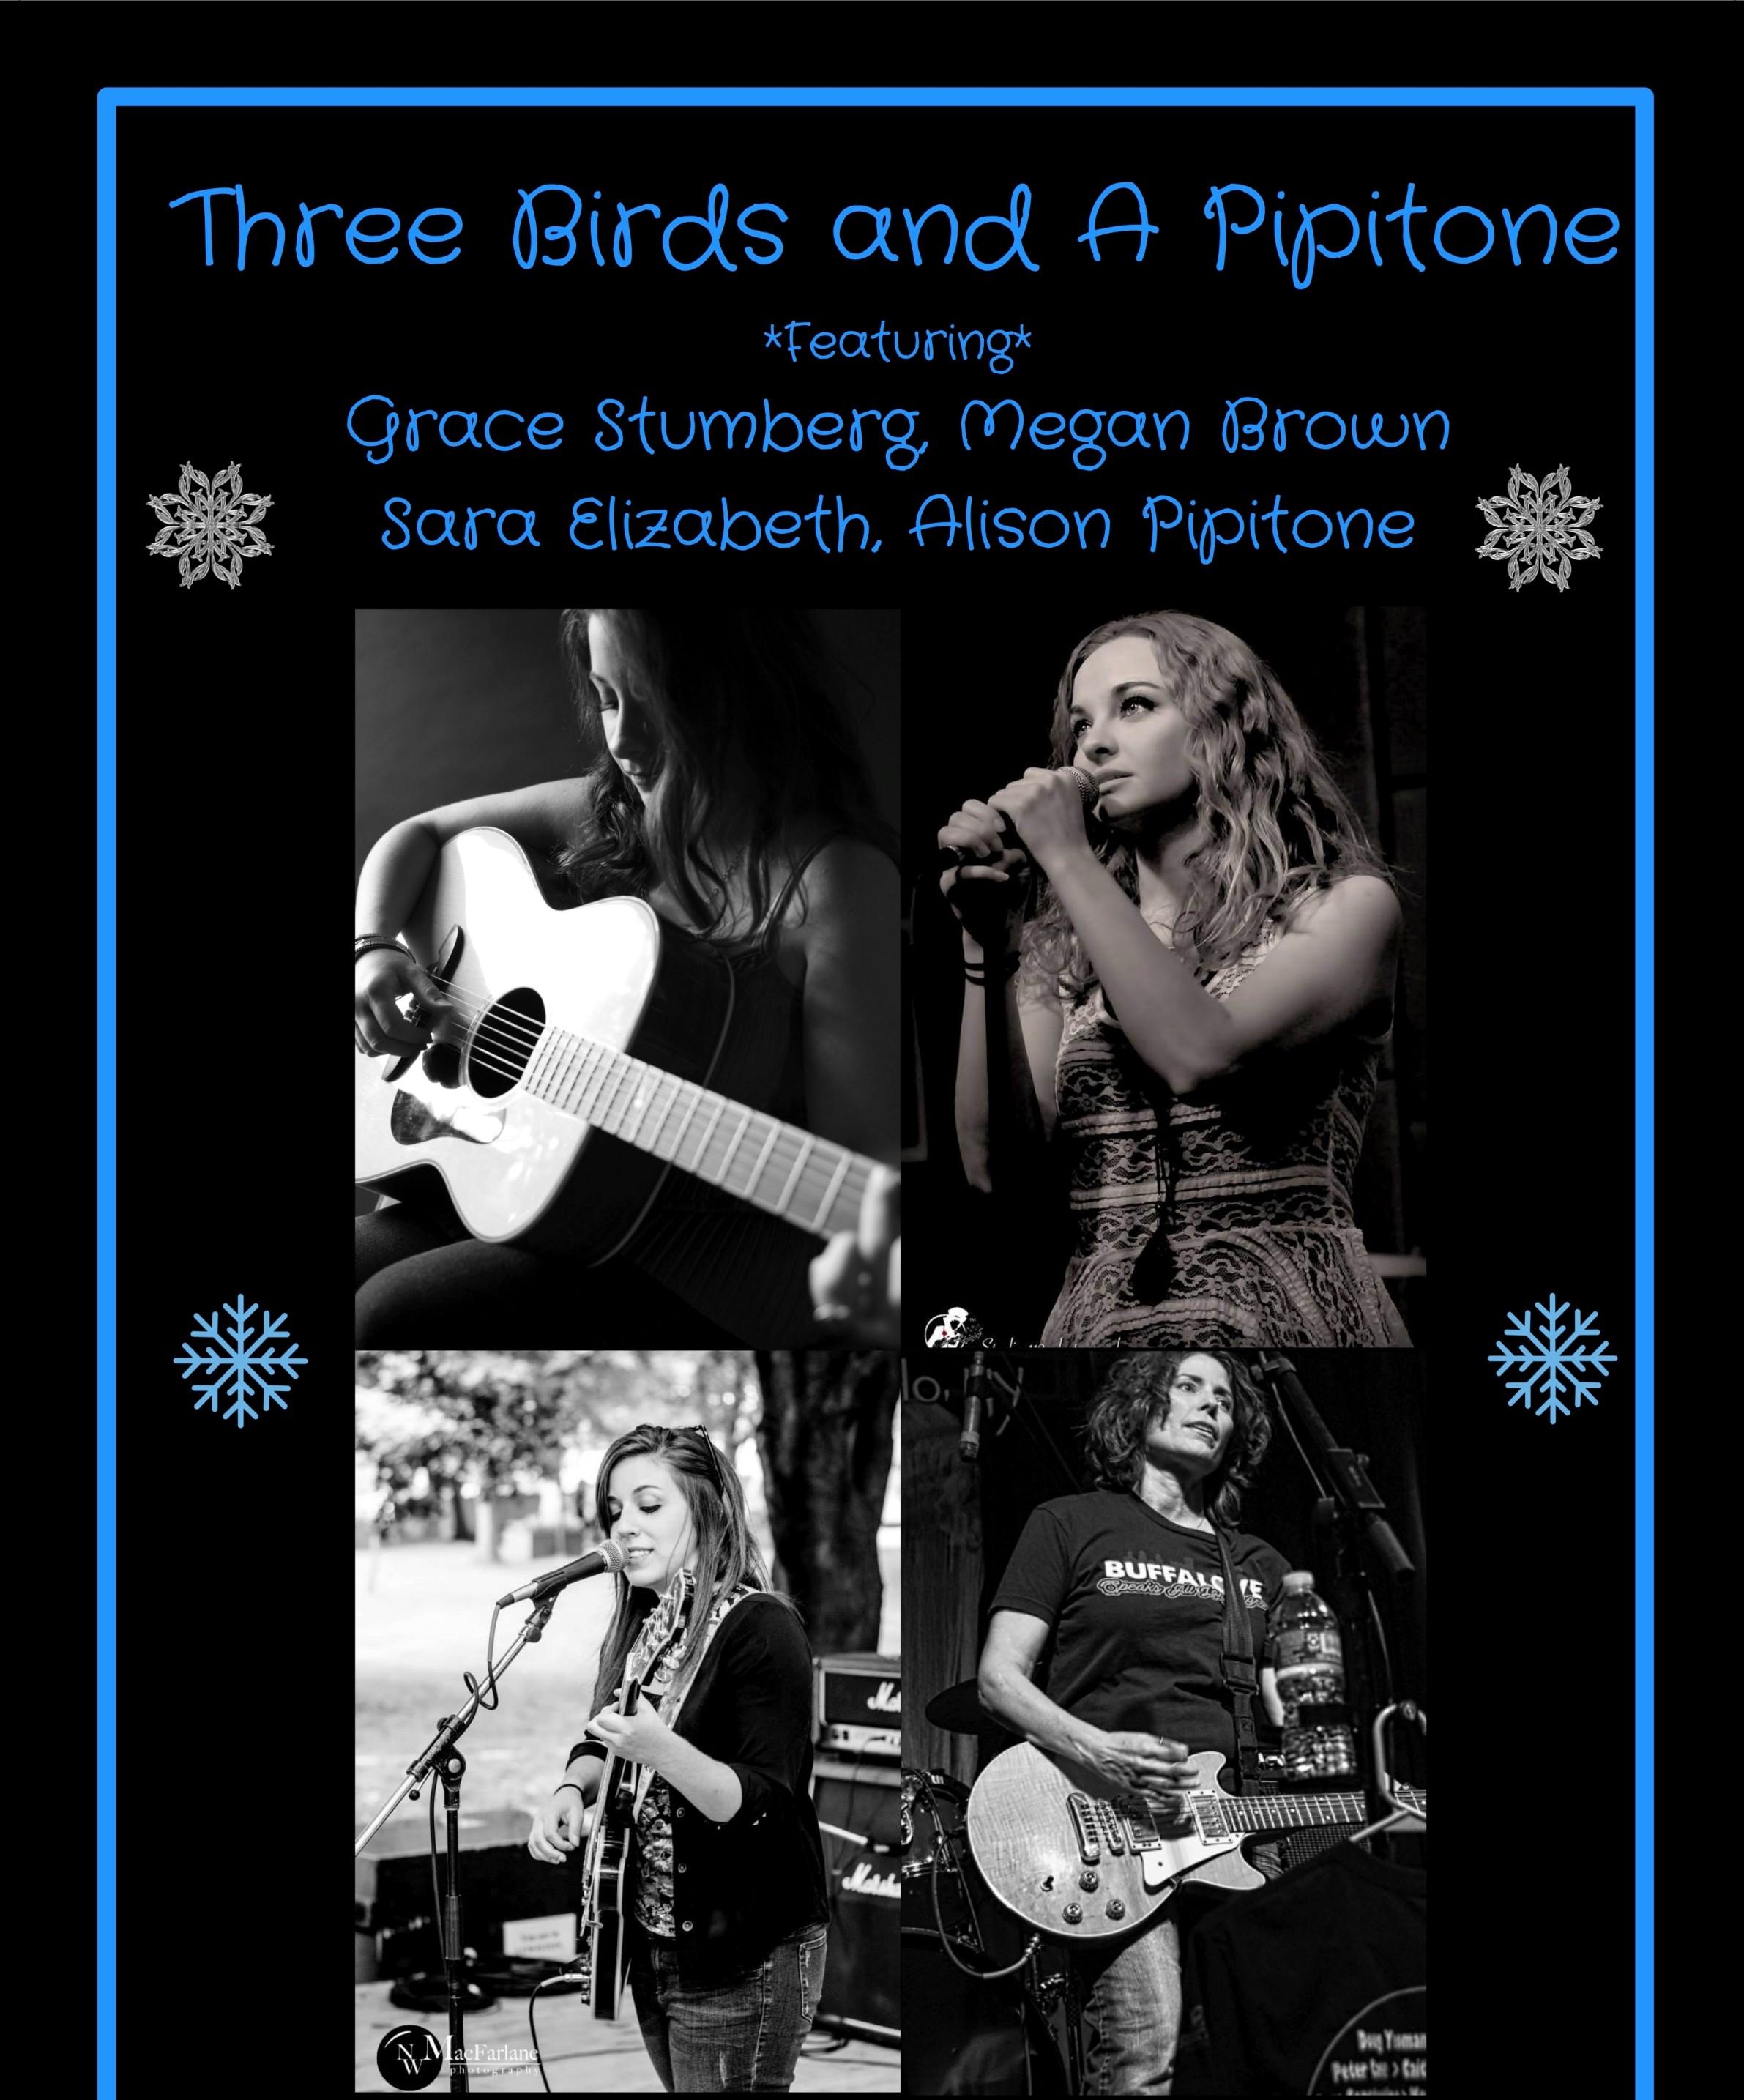 Three Birds and A Pipitone (ft. Grace Stumberg, Megan Brown, Sara Elizabeth & Alison Pipitone)